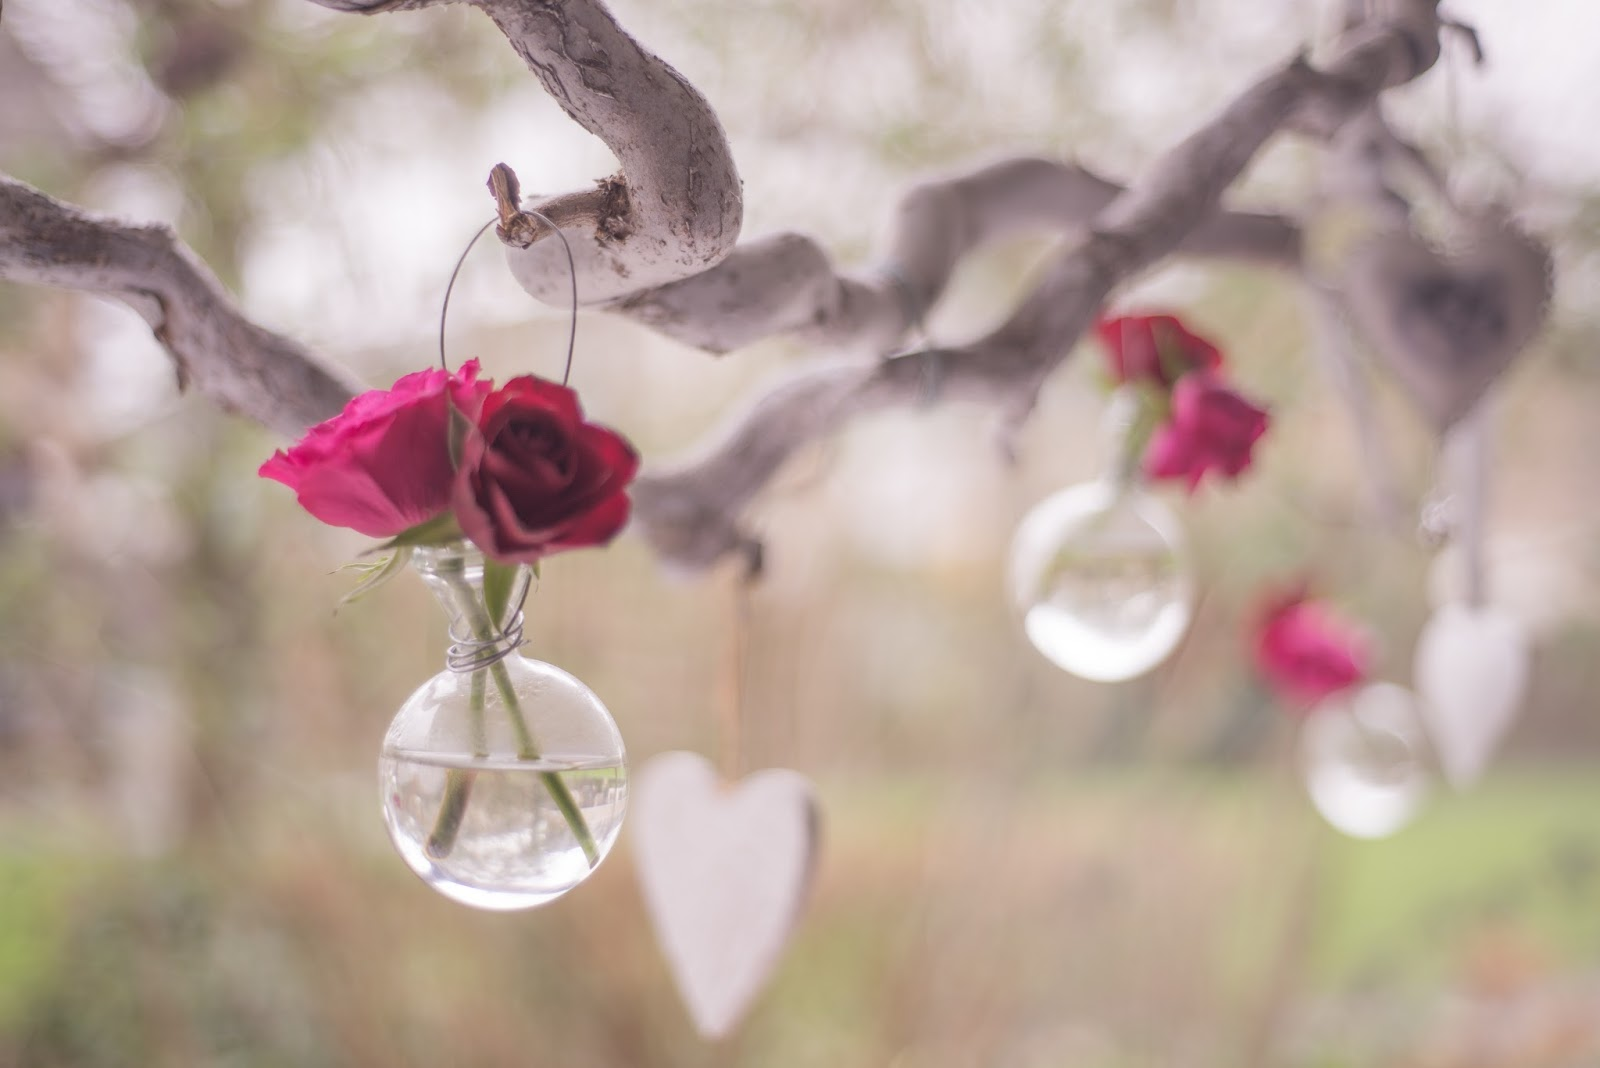 Pink roses o blog da mó valentine's day